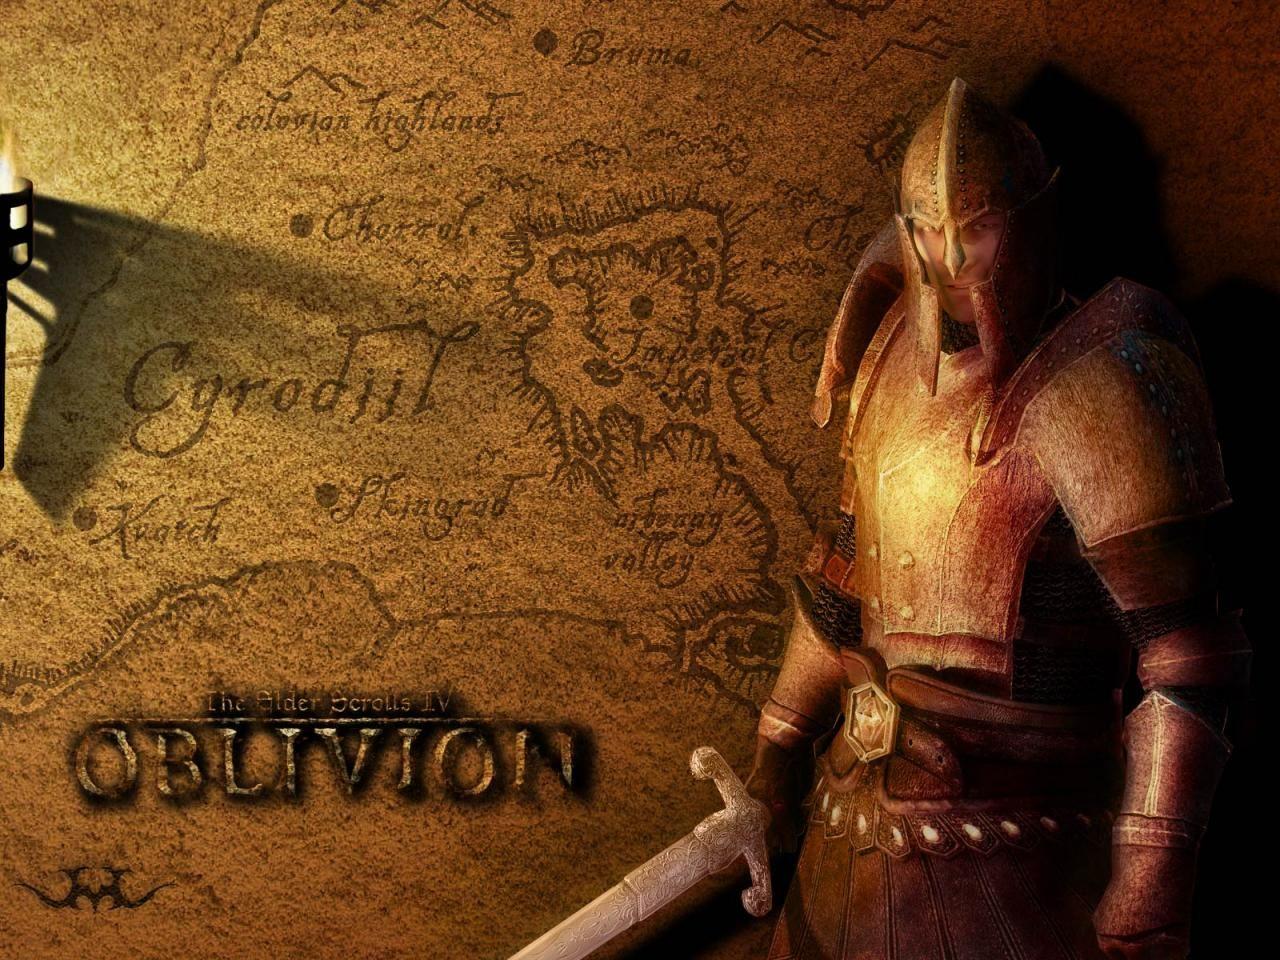 The Elder Scrolls Oblivion Wallpaper